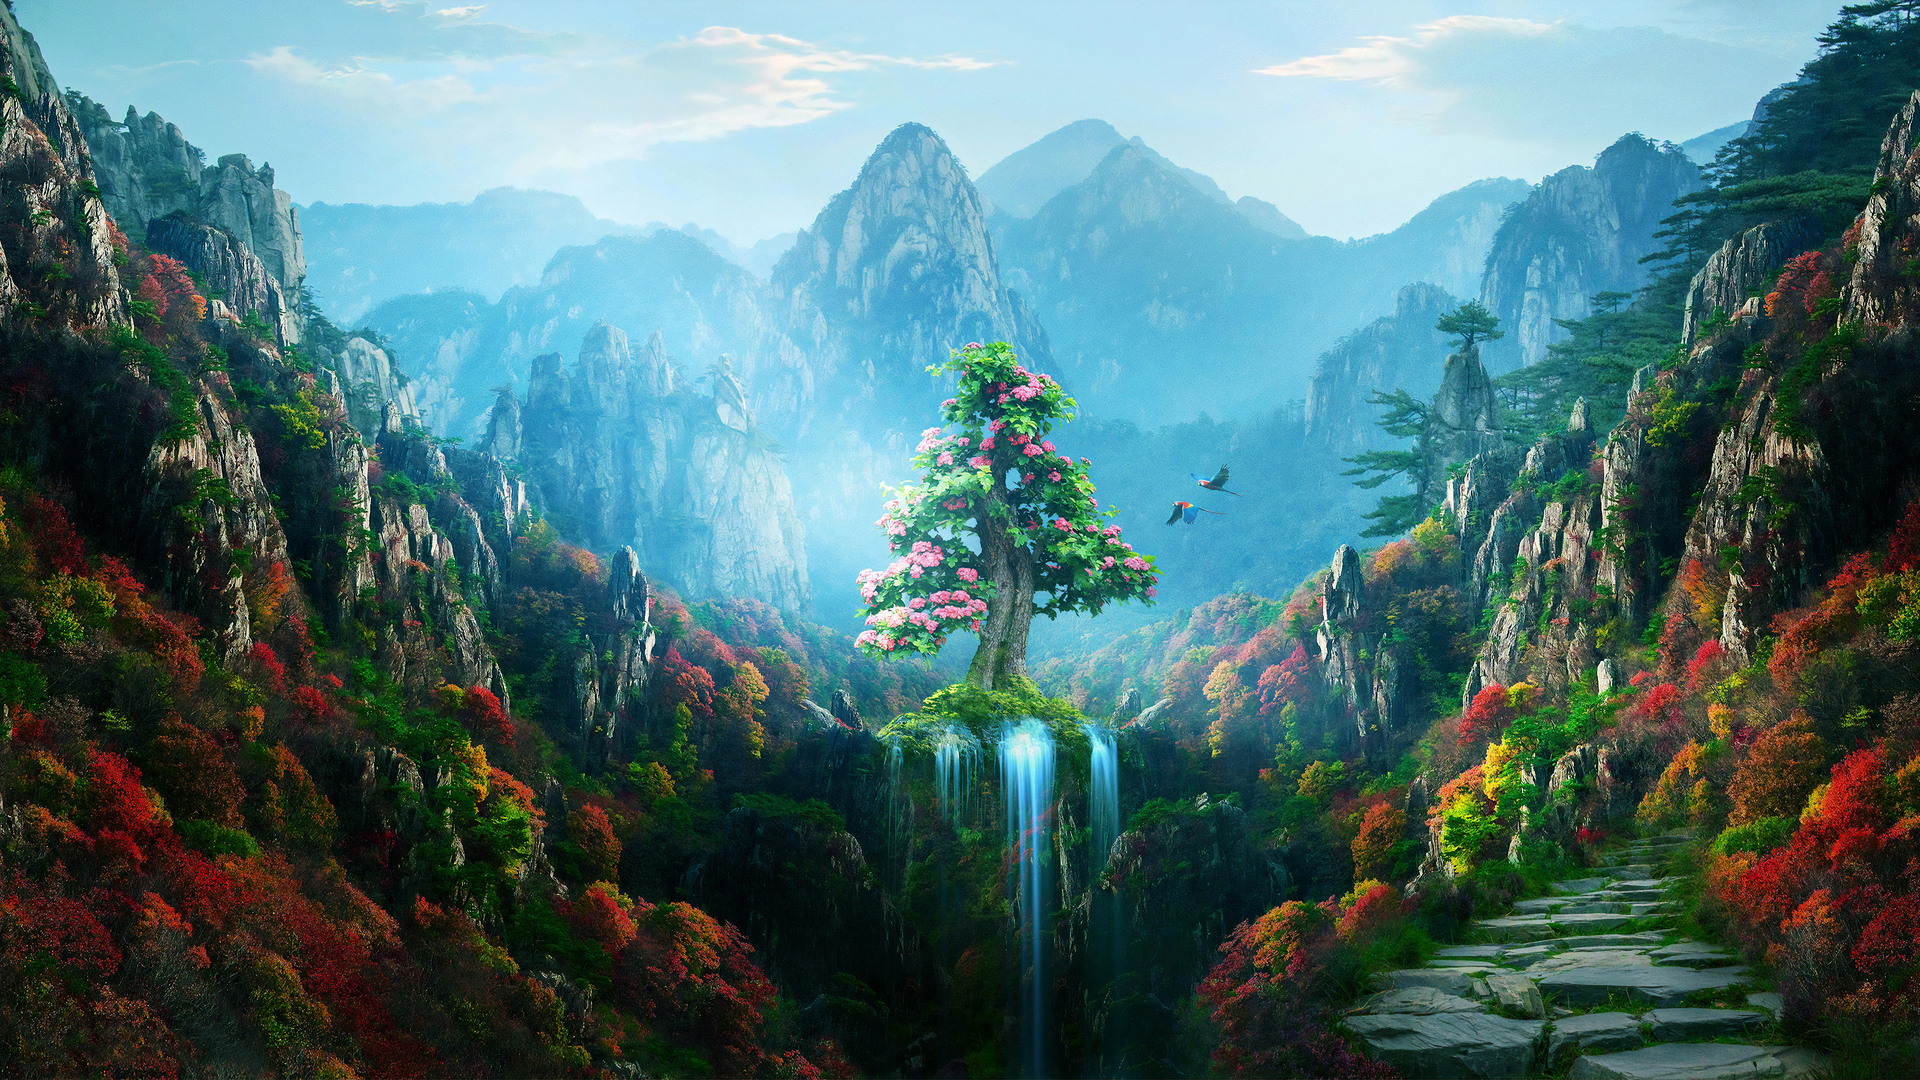 Wartamediaberita 1080p Full Hd Hd Wallpaper Nature 4k